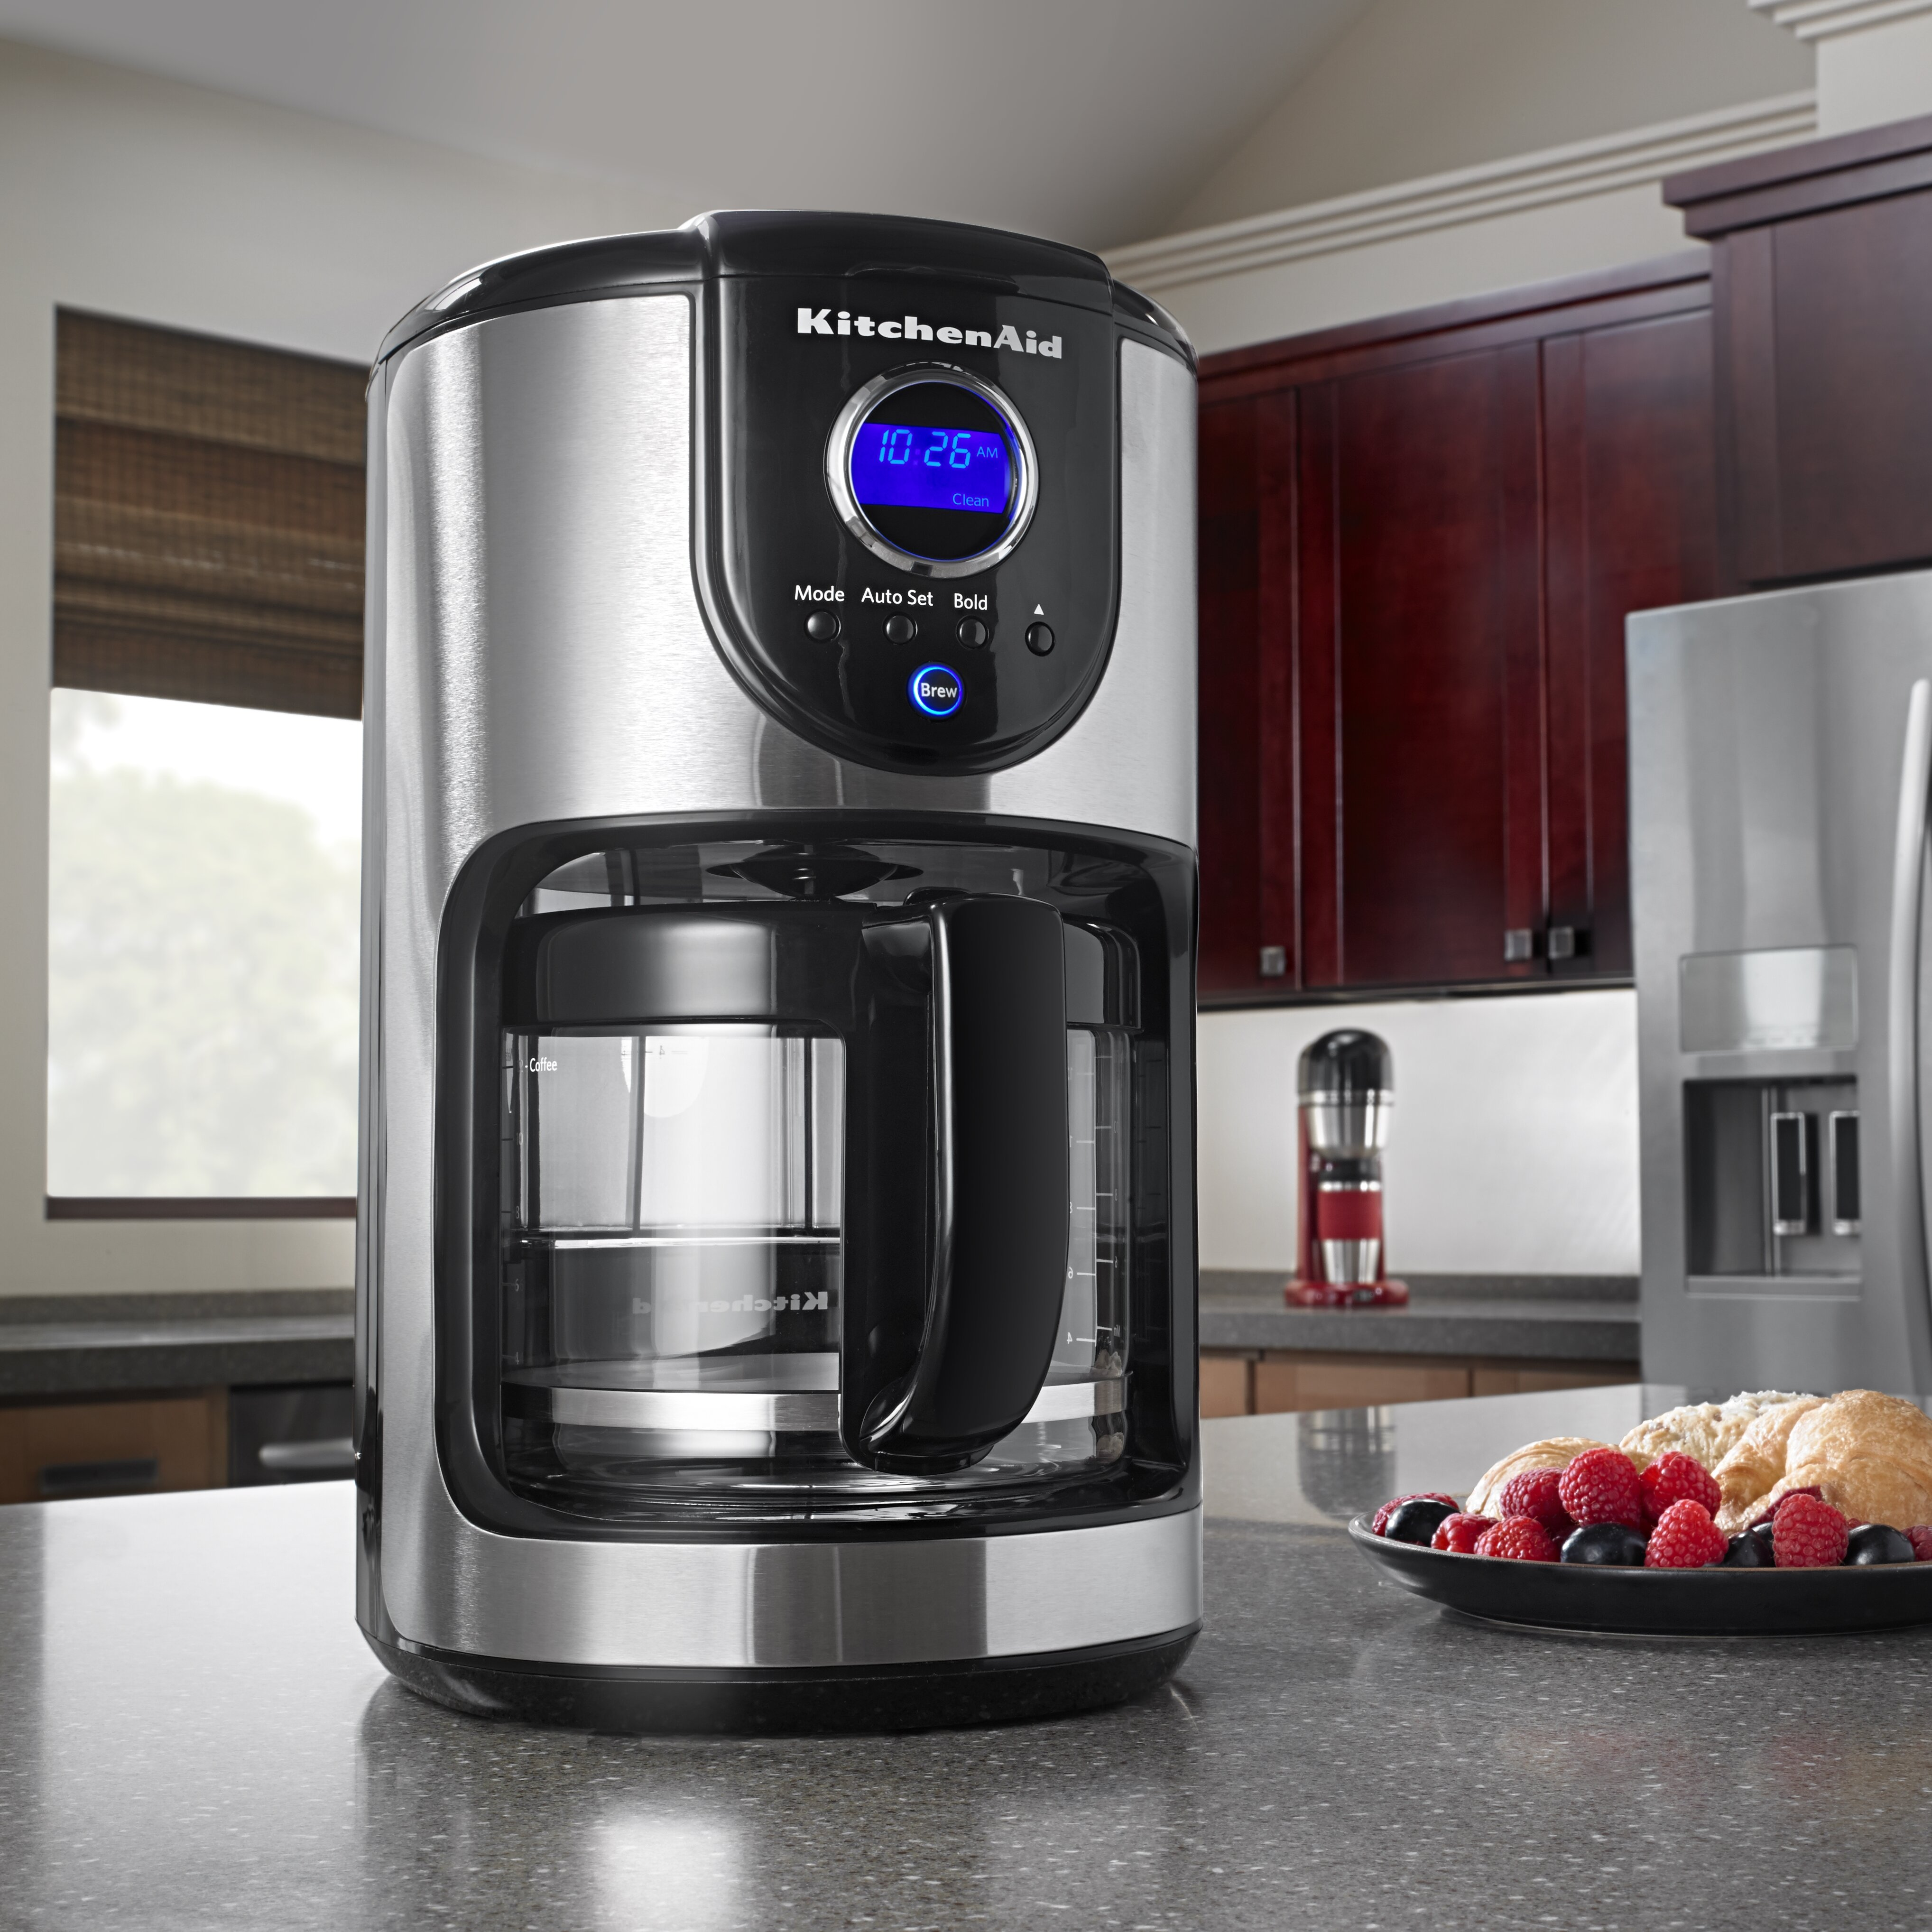 Kitchen Living Coffee Maker Reviews : KitchenAid Personal 4 Cup Coffee Maker & Reviews Wayfair